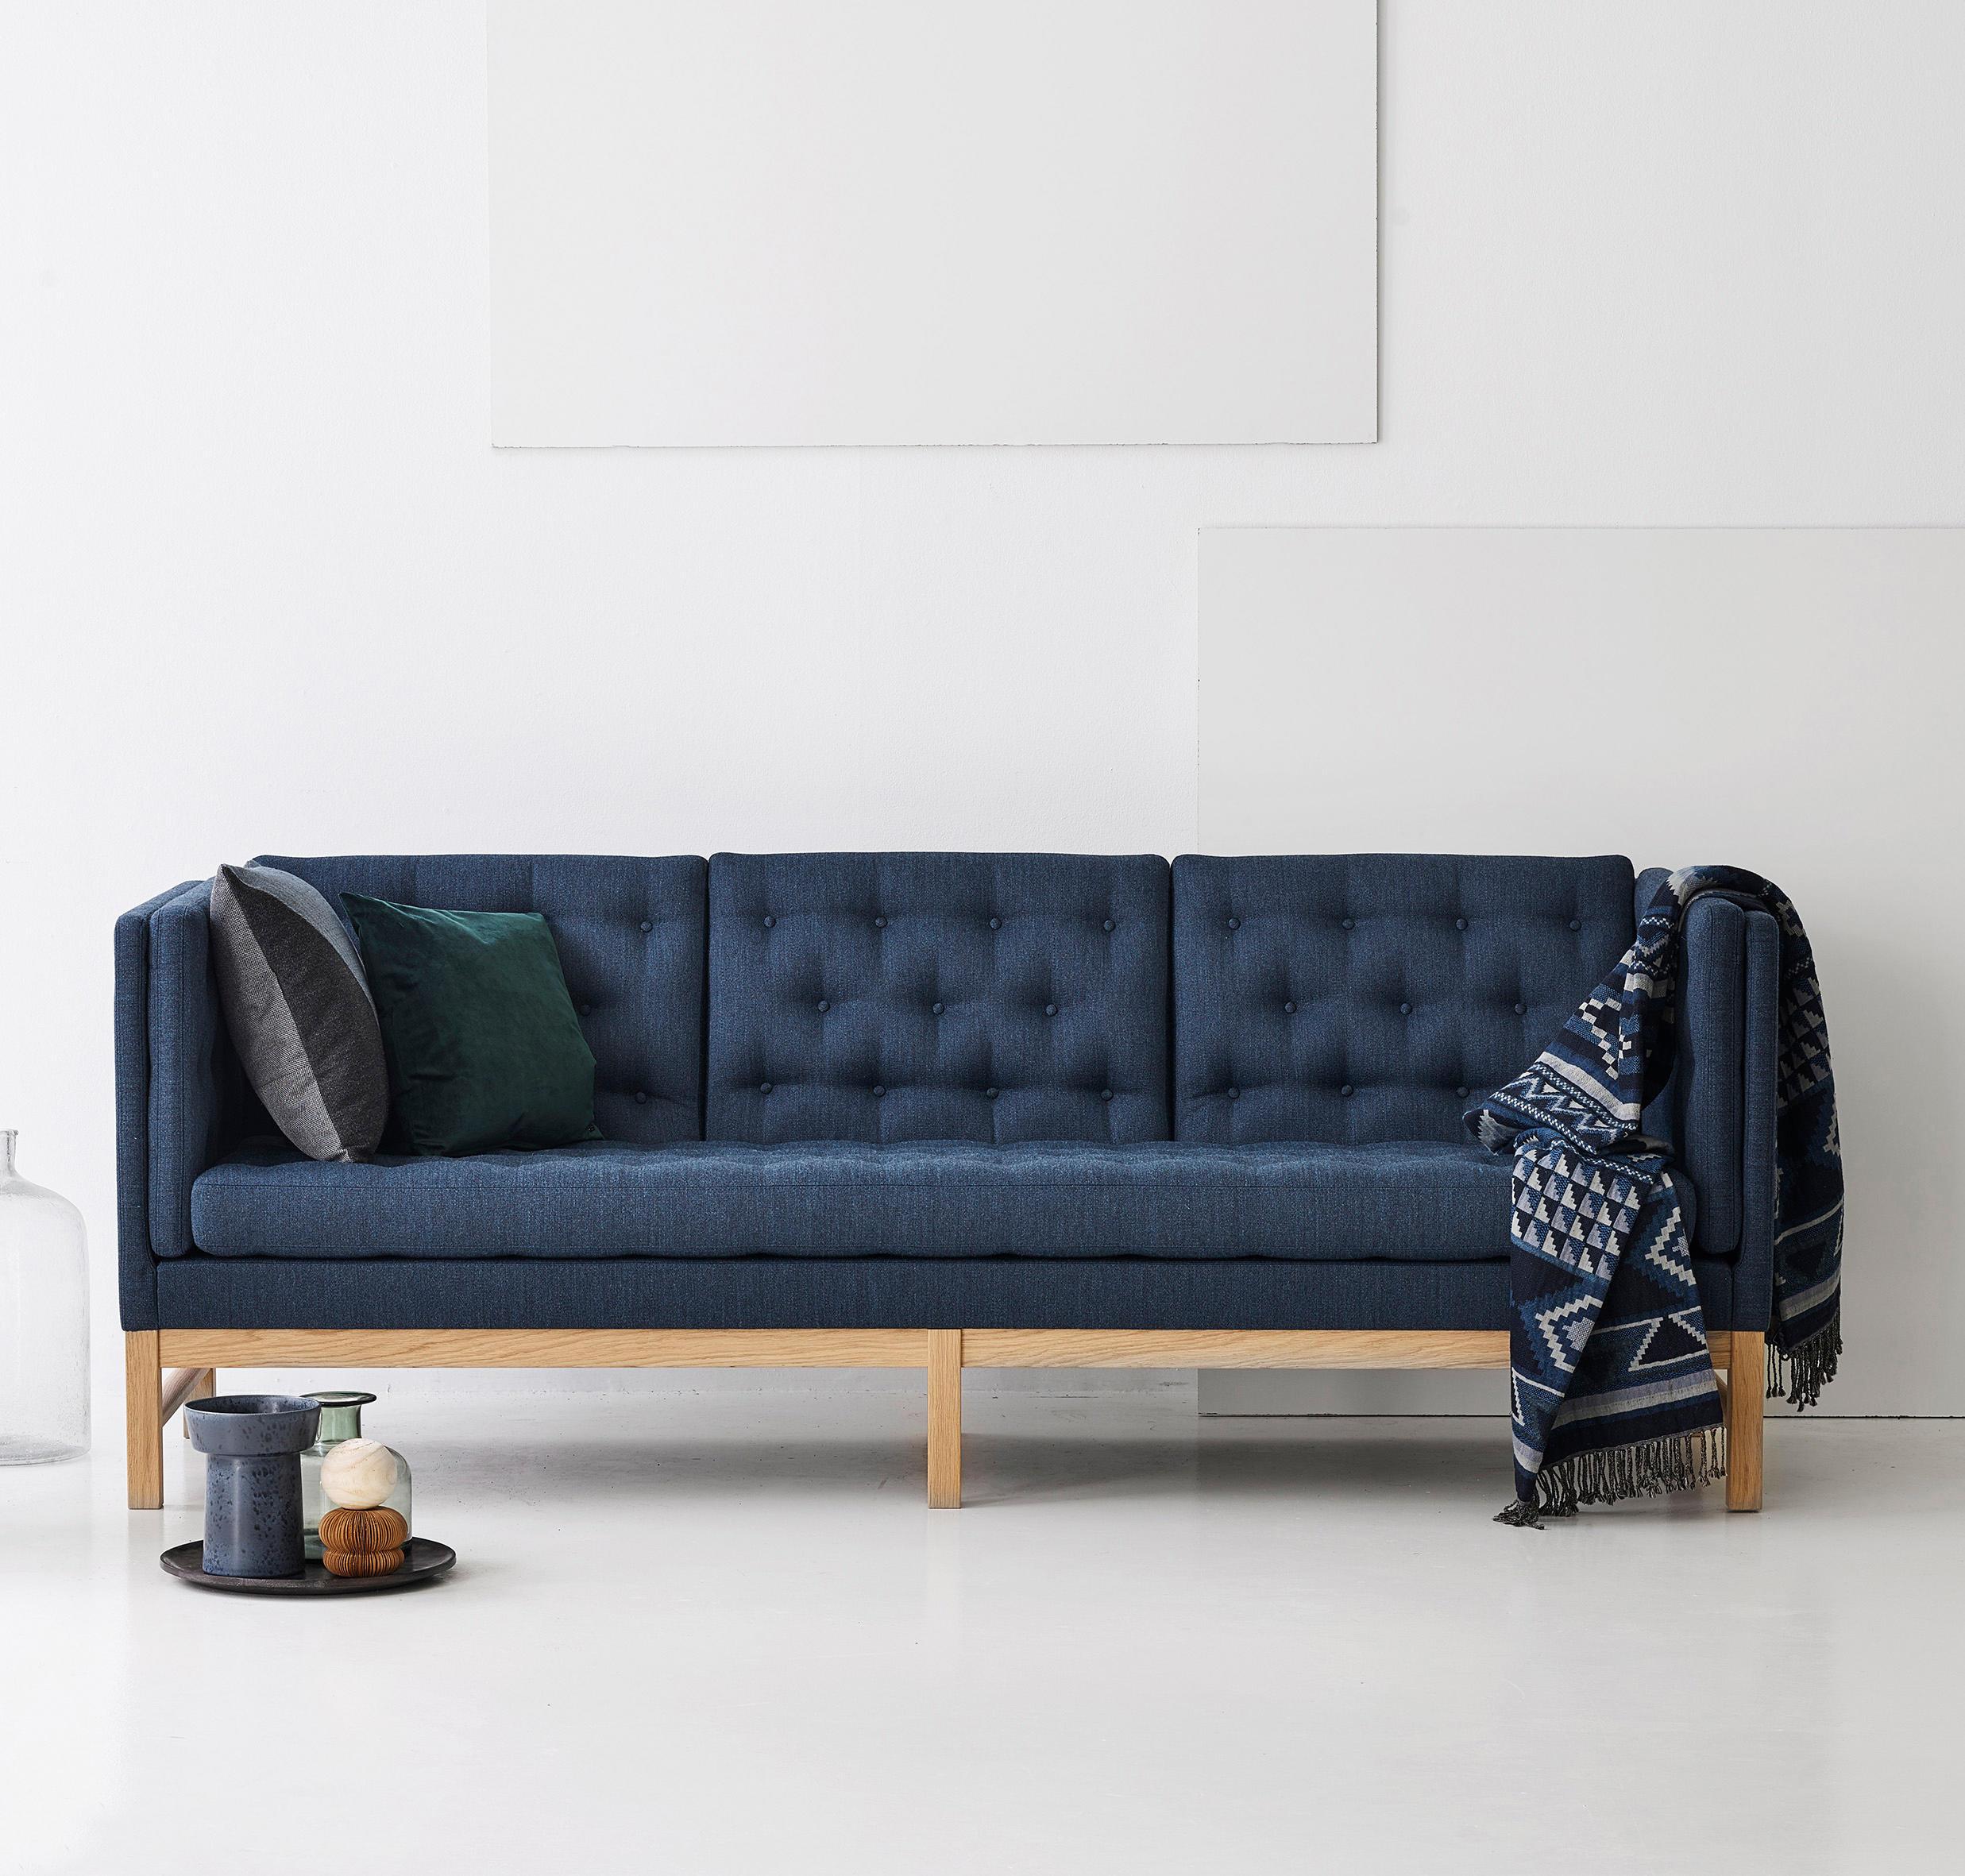 ej 315 1 loungesessel von erik j rgensen architonic. Black Bedroom Furniture Sets. Home Design Ideas